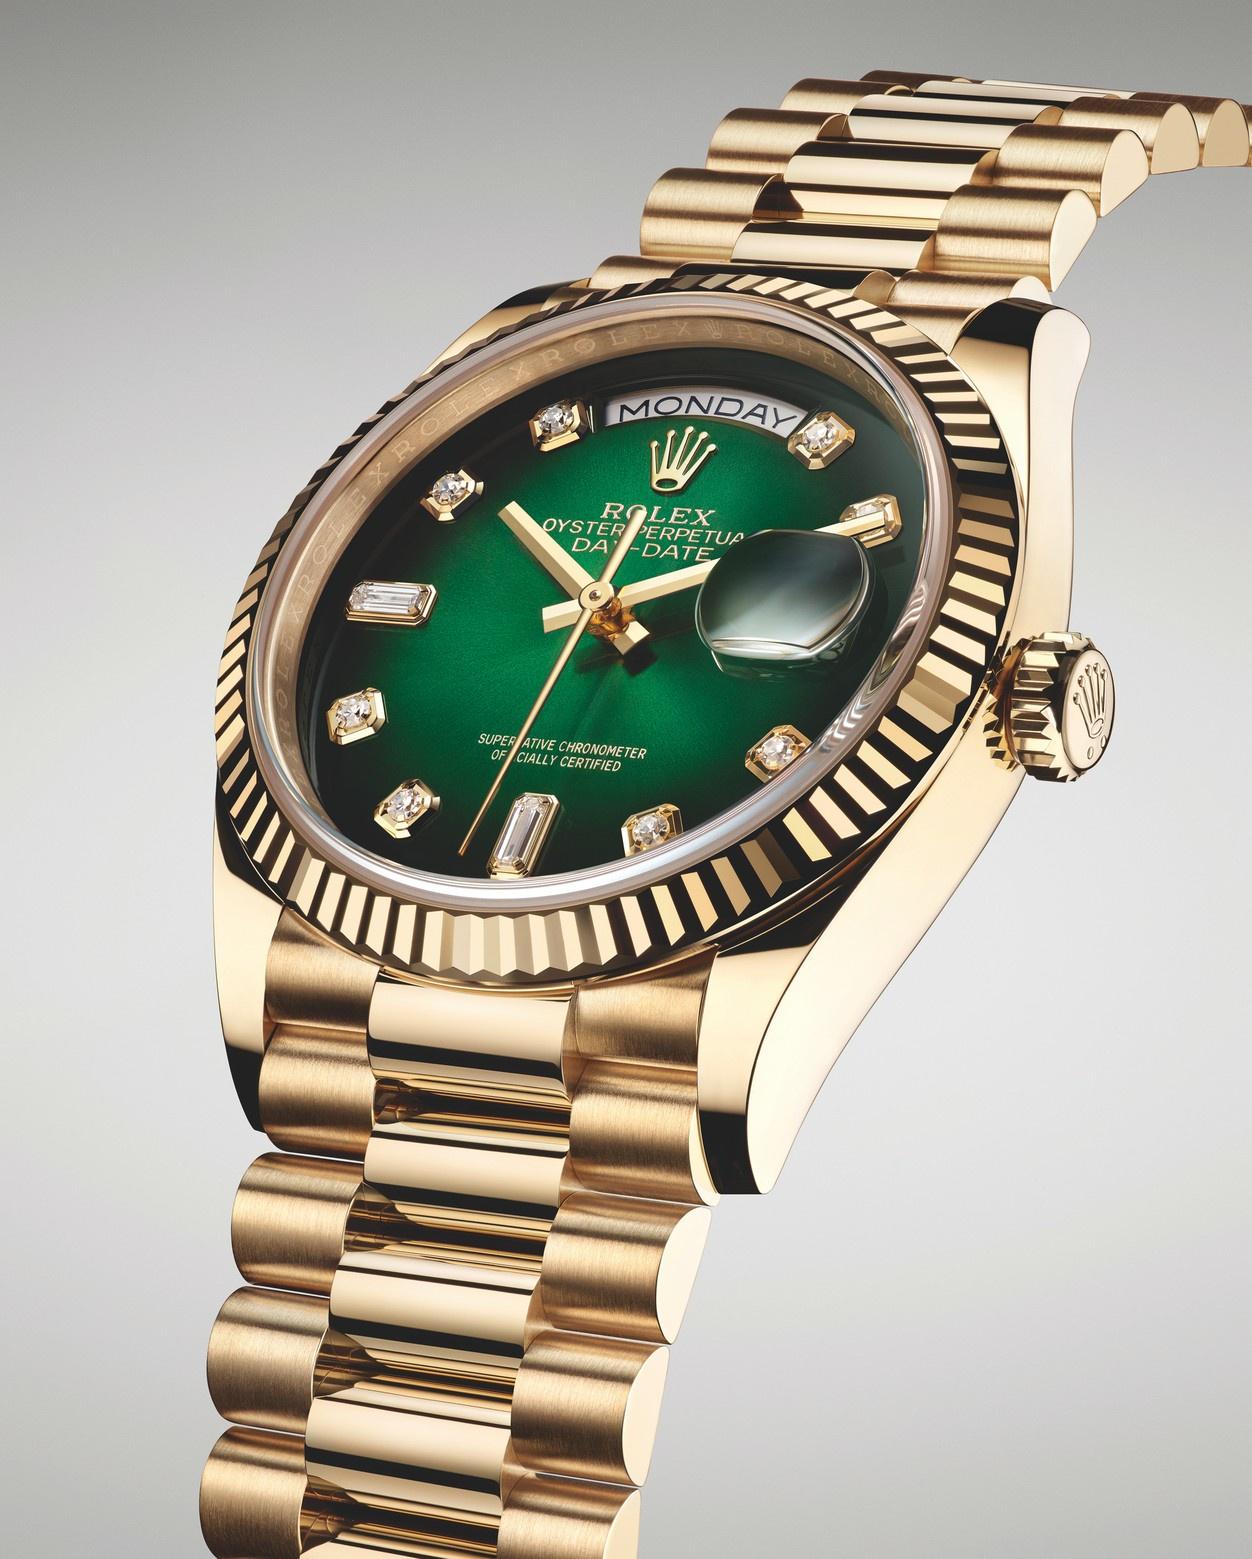 Diamond Rolex Day-Date.